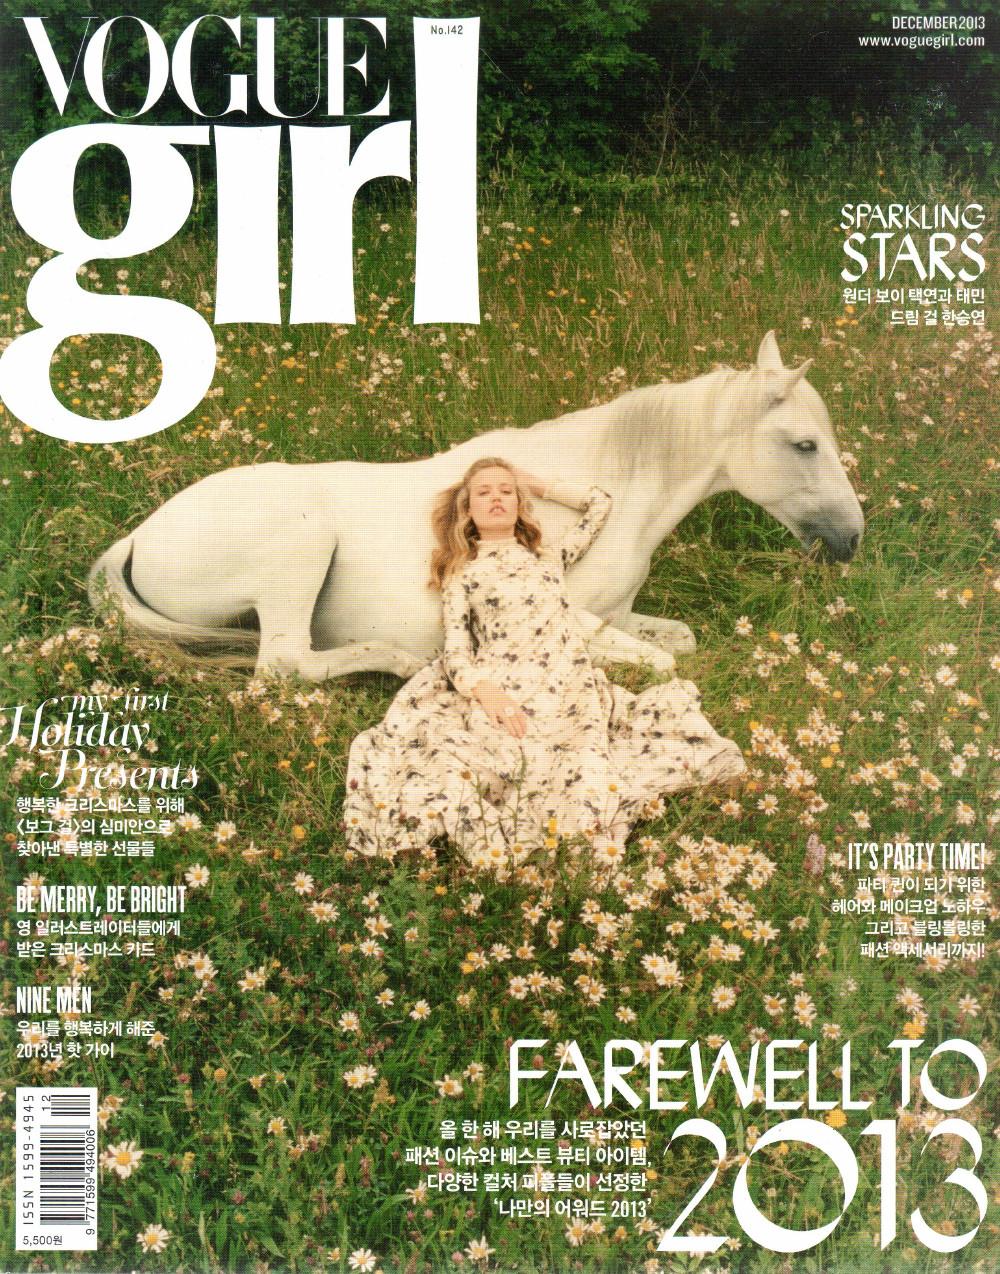 Vogue Girl Dec 13